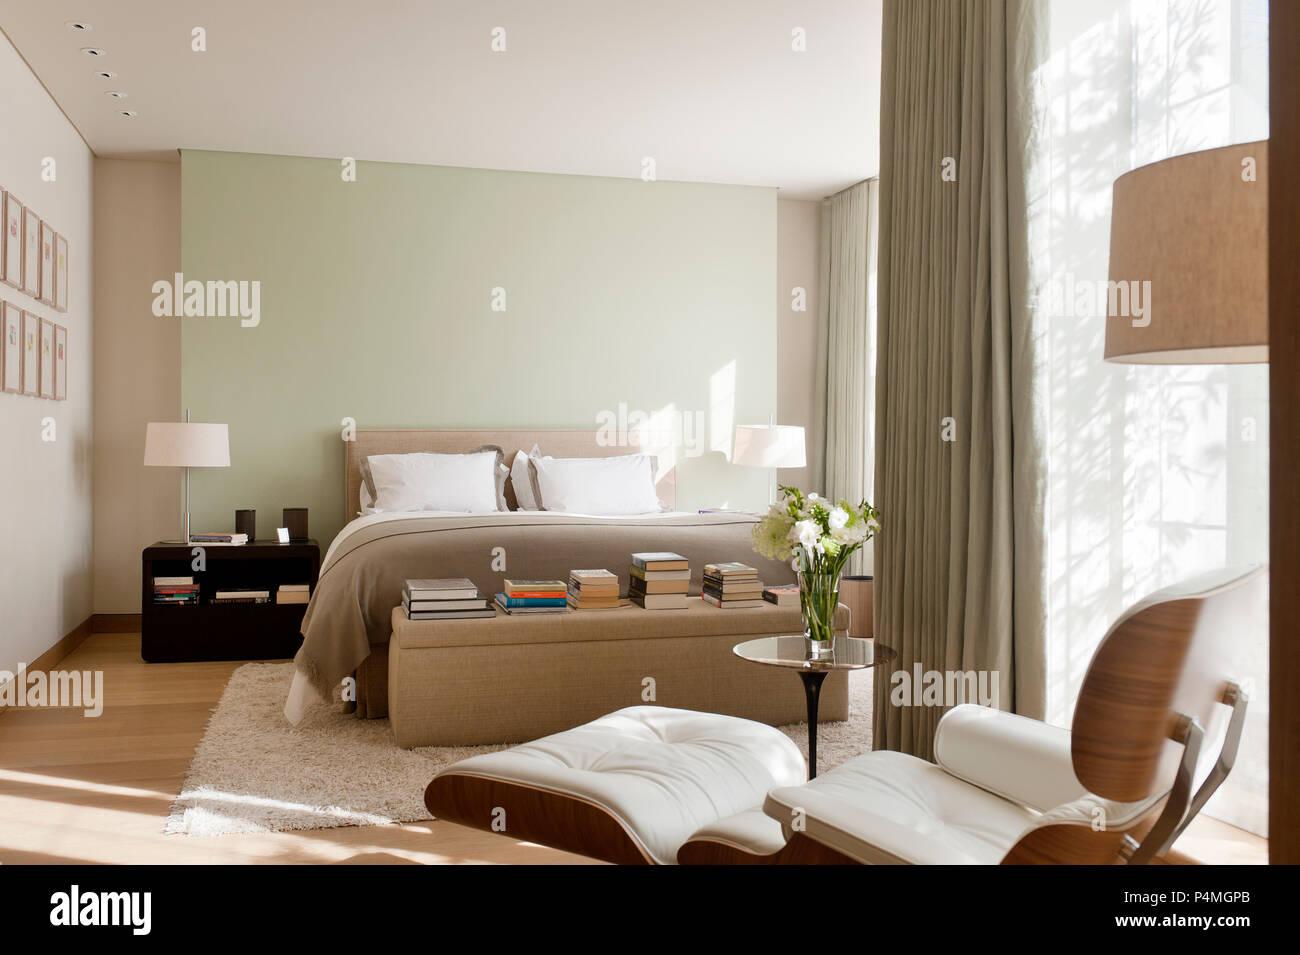 Sessel im Schlafzimmer Stockfoto, Bild: 209435251 - Alamy